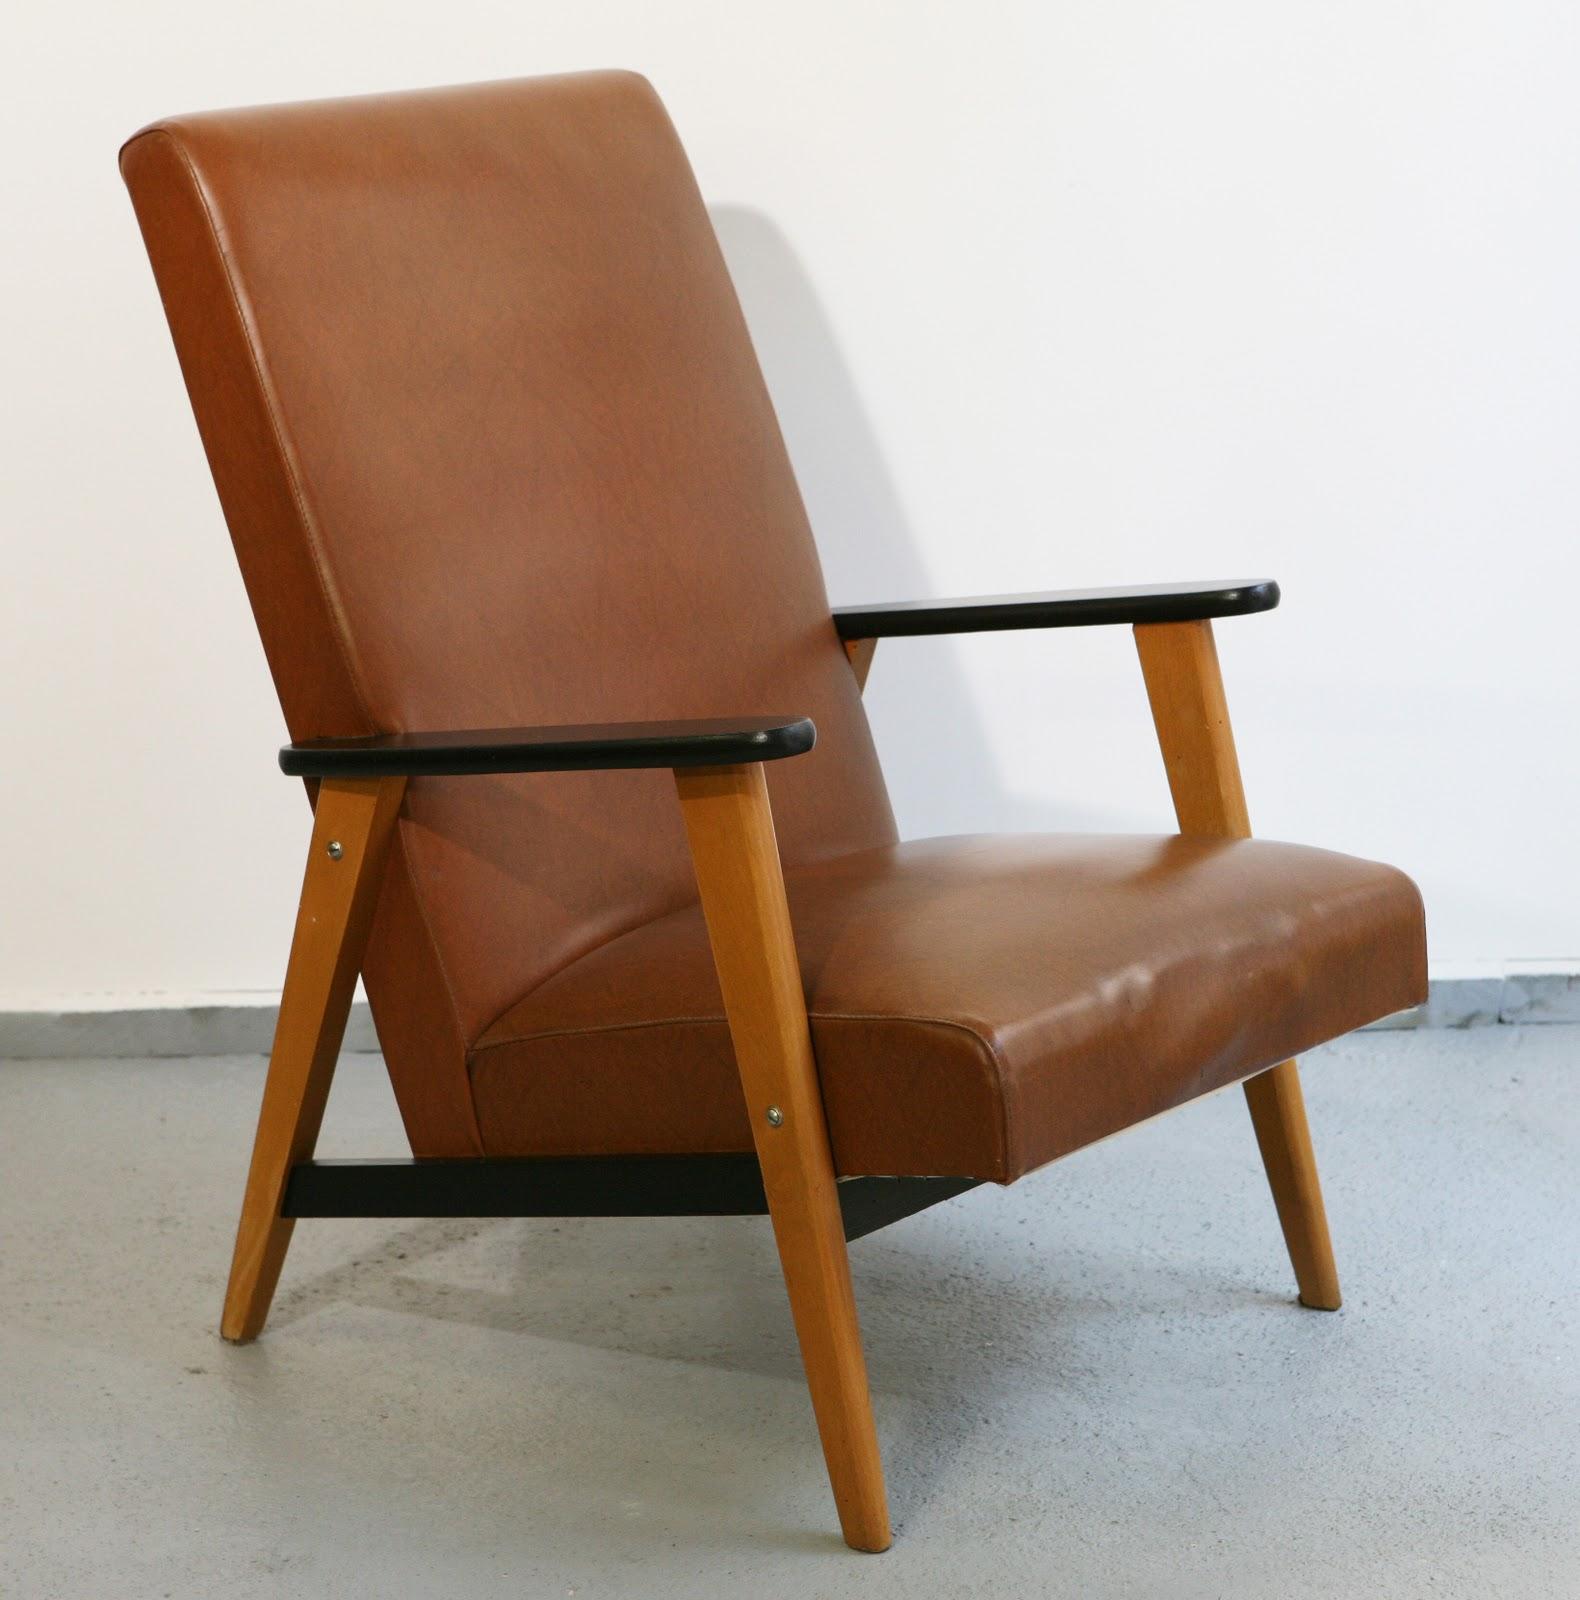 baos fauteuil vintage ann es 60 en ska. Black Bedroom Furniture Sets. Home Design Ideas